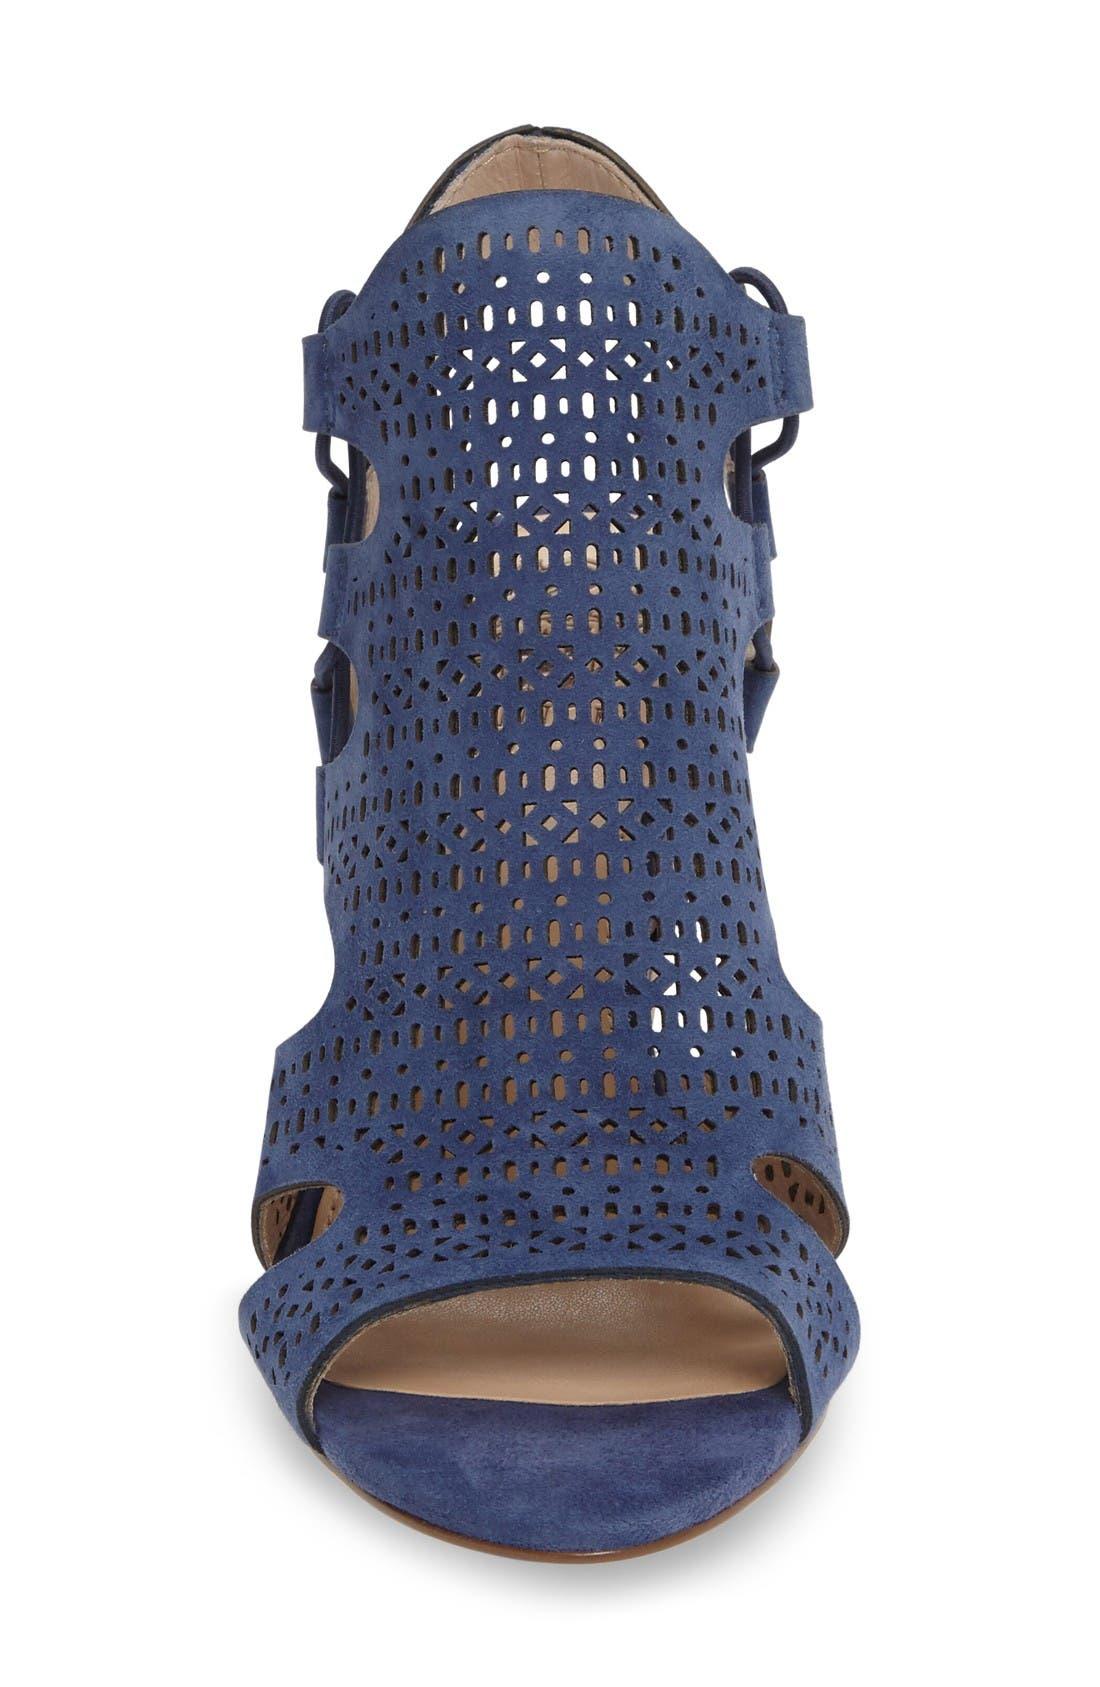 Alternate Image 3  - Vince Camuto Eadon Cutout Sandal (Women)